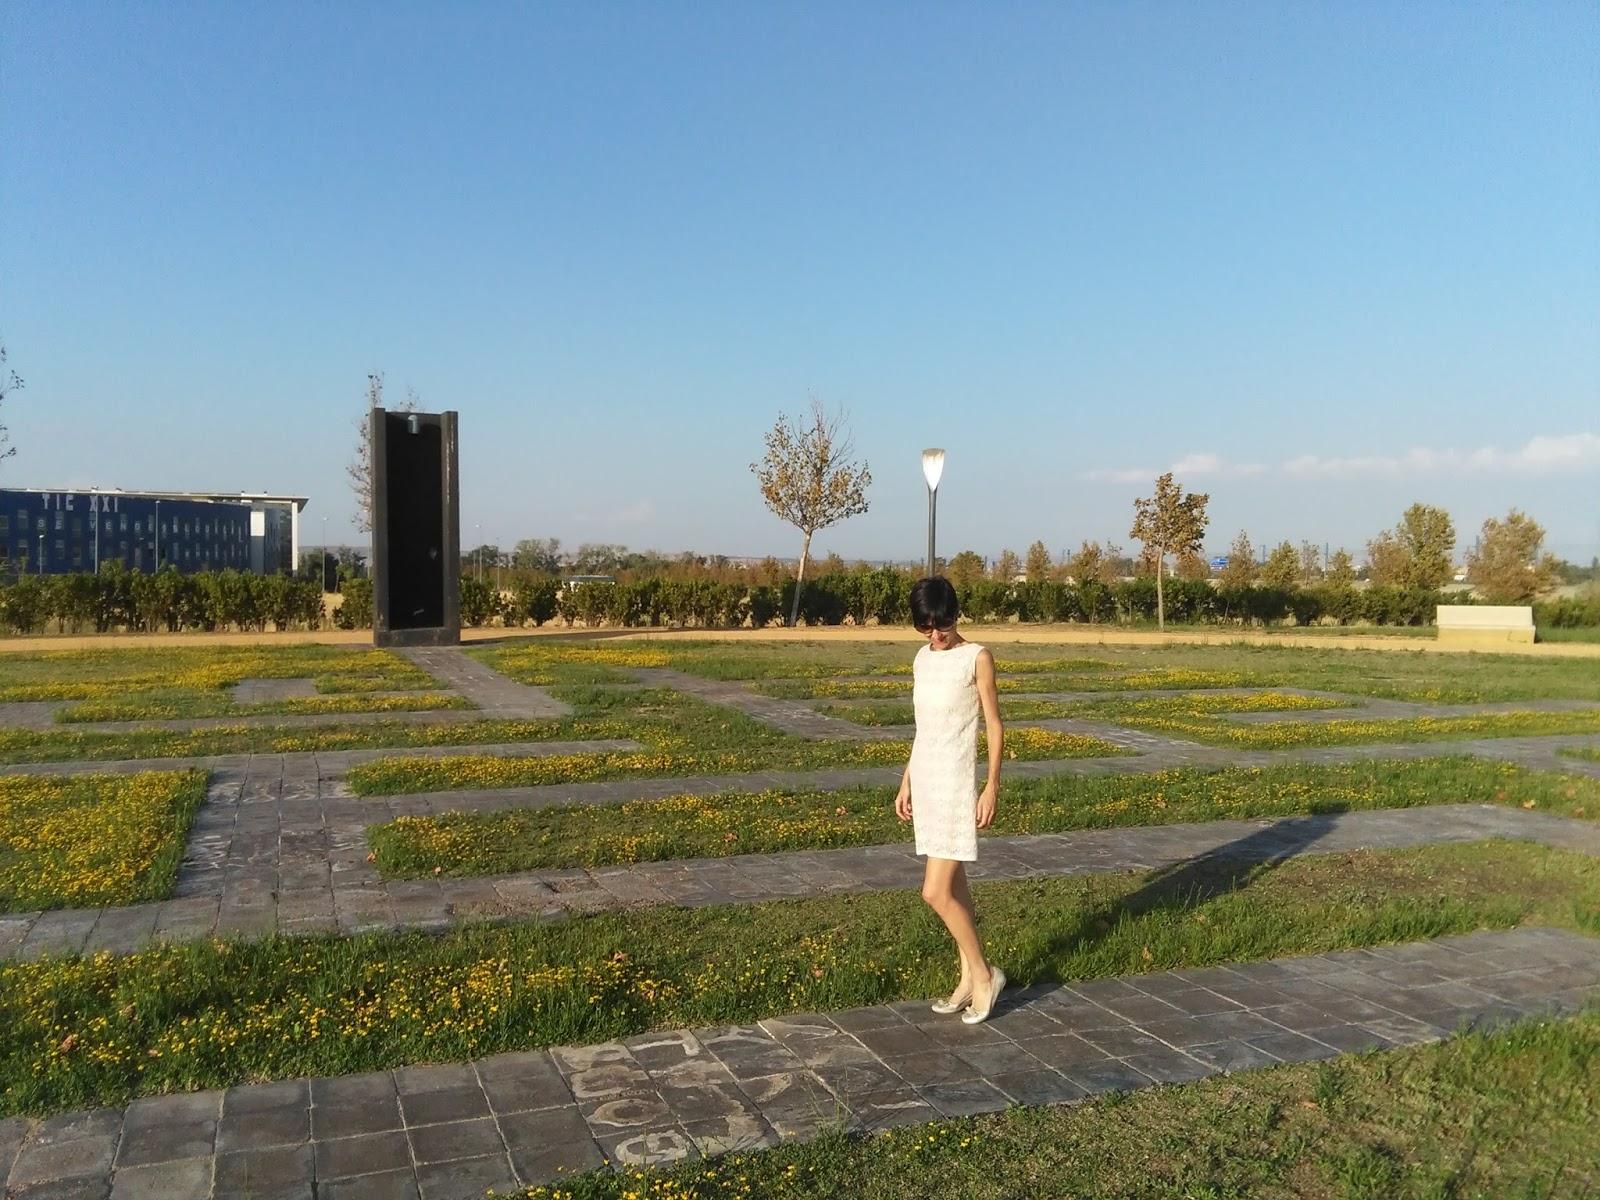 Blogssipgirl Blogssipgirl Ha Estado Allí Parque Lineal Plaza